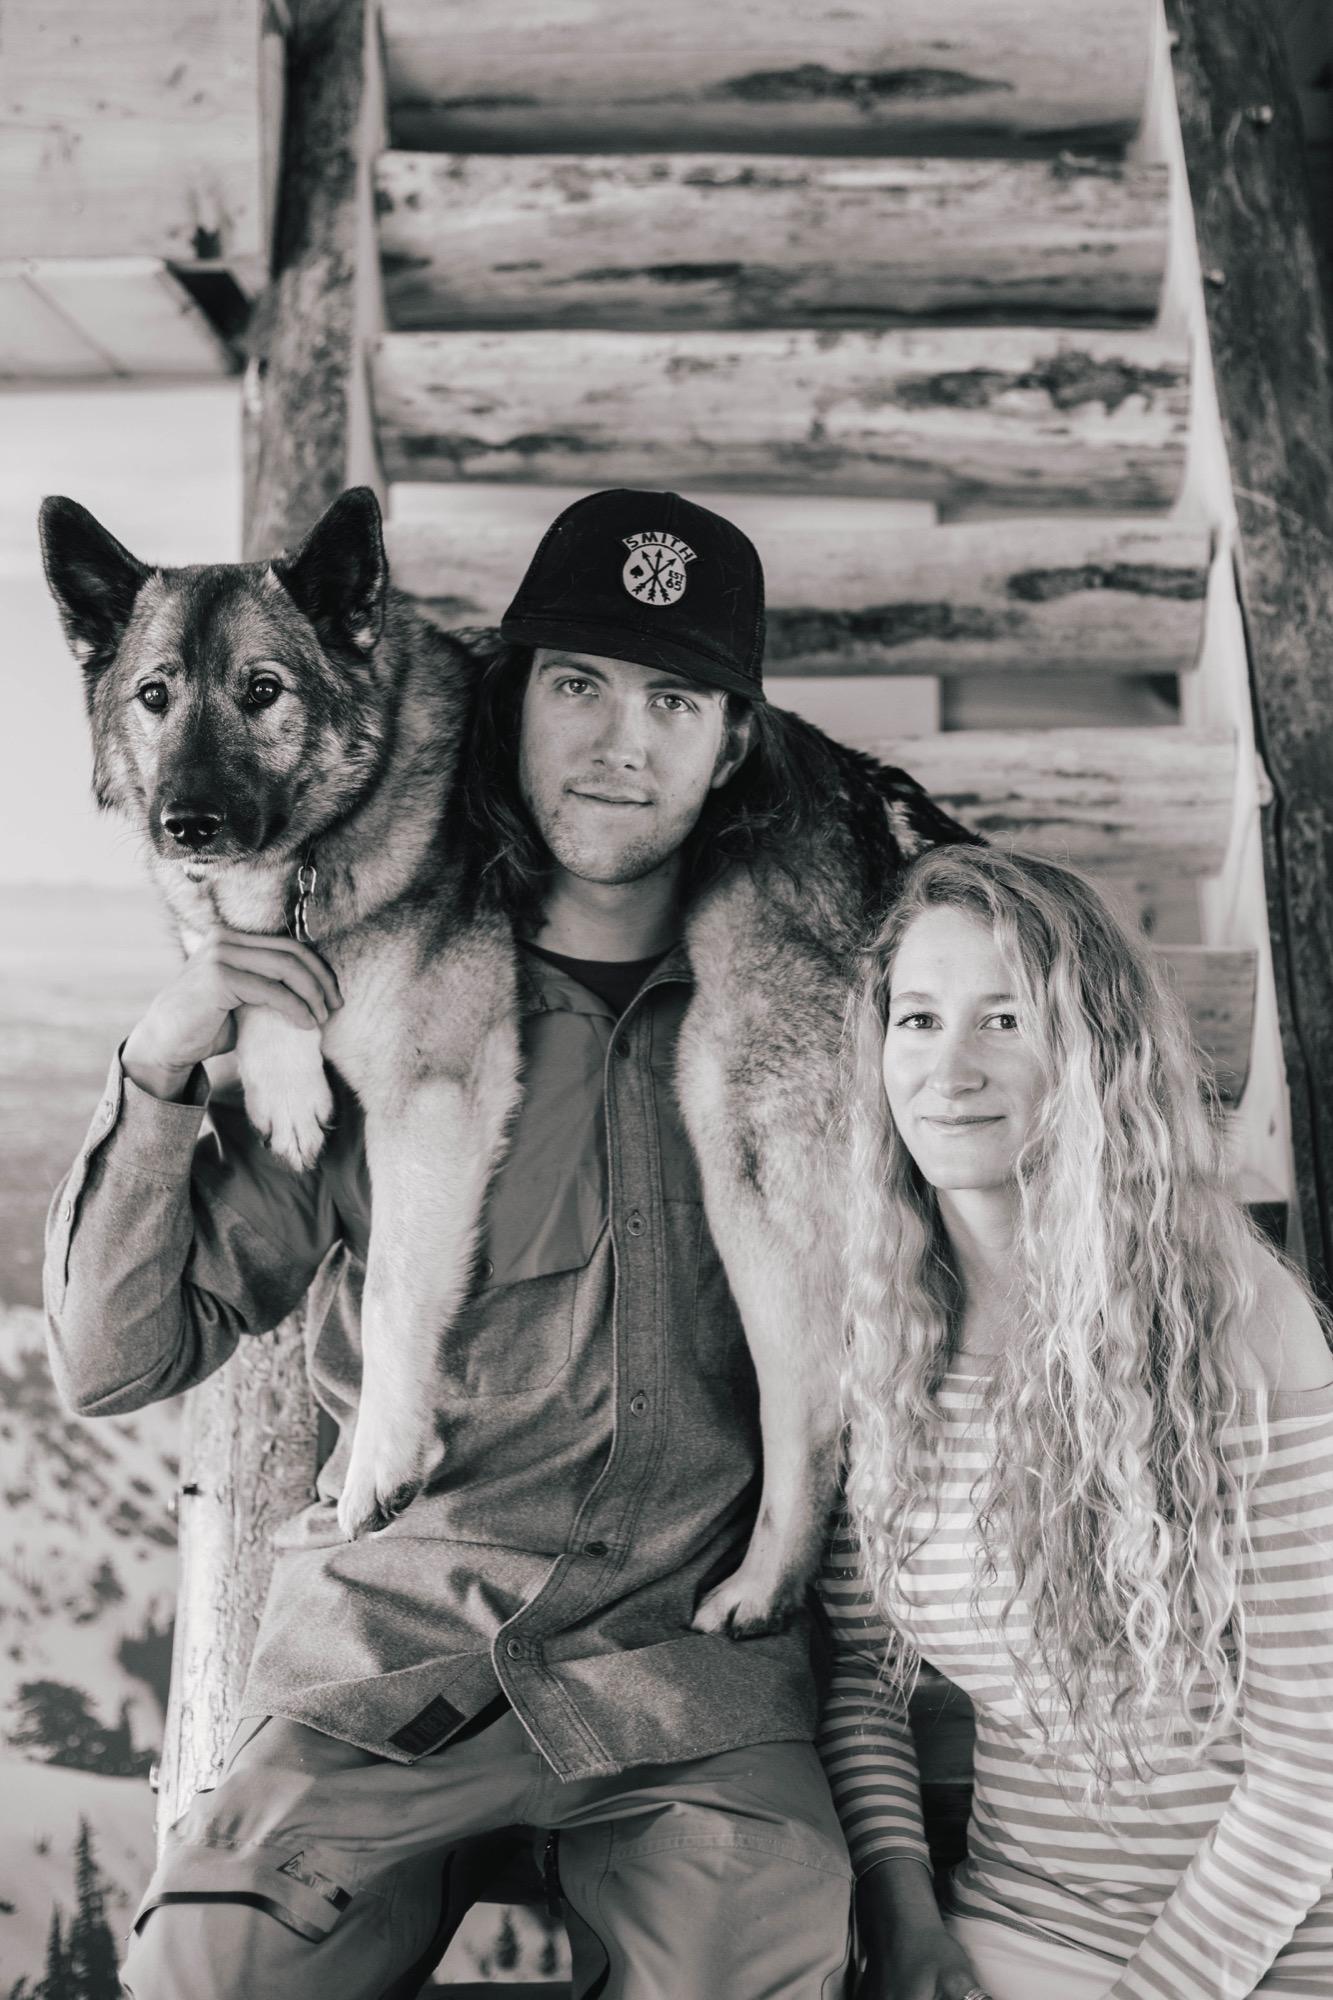 Zach and Cindi Lou Grant / Photo by Kate Osborne